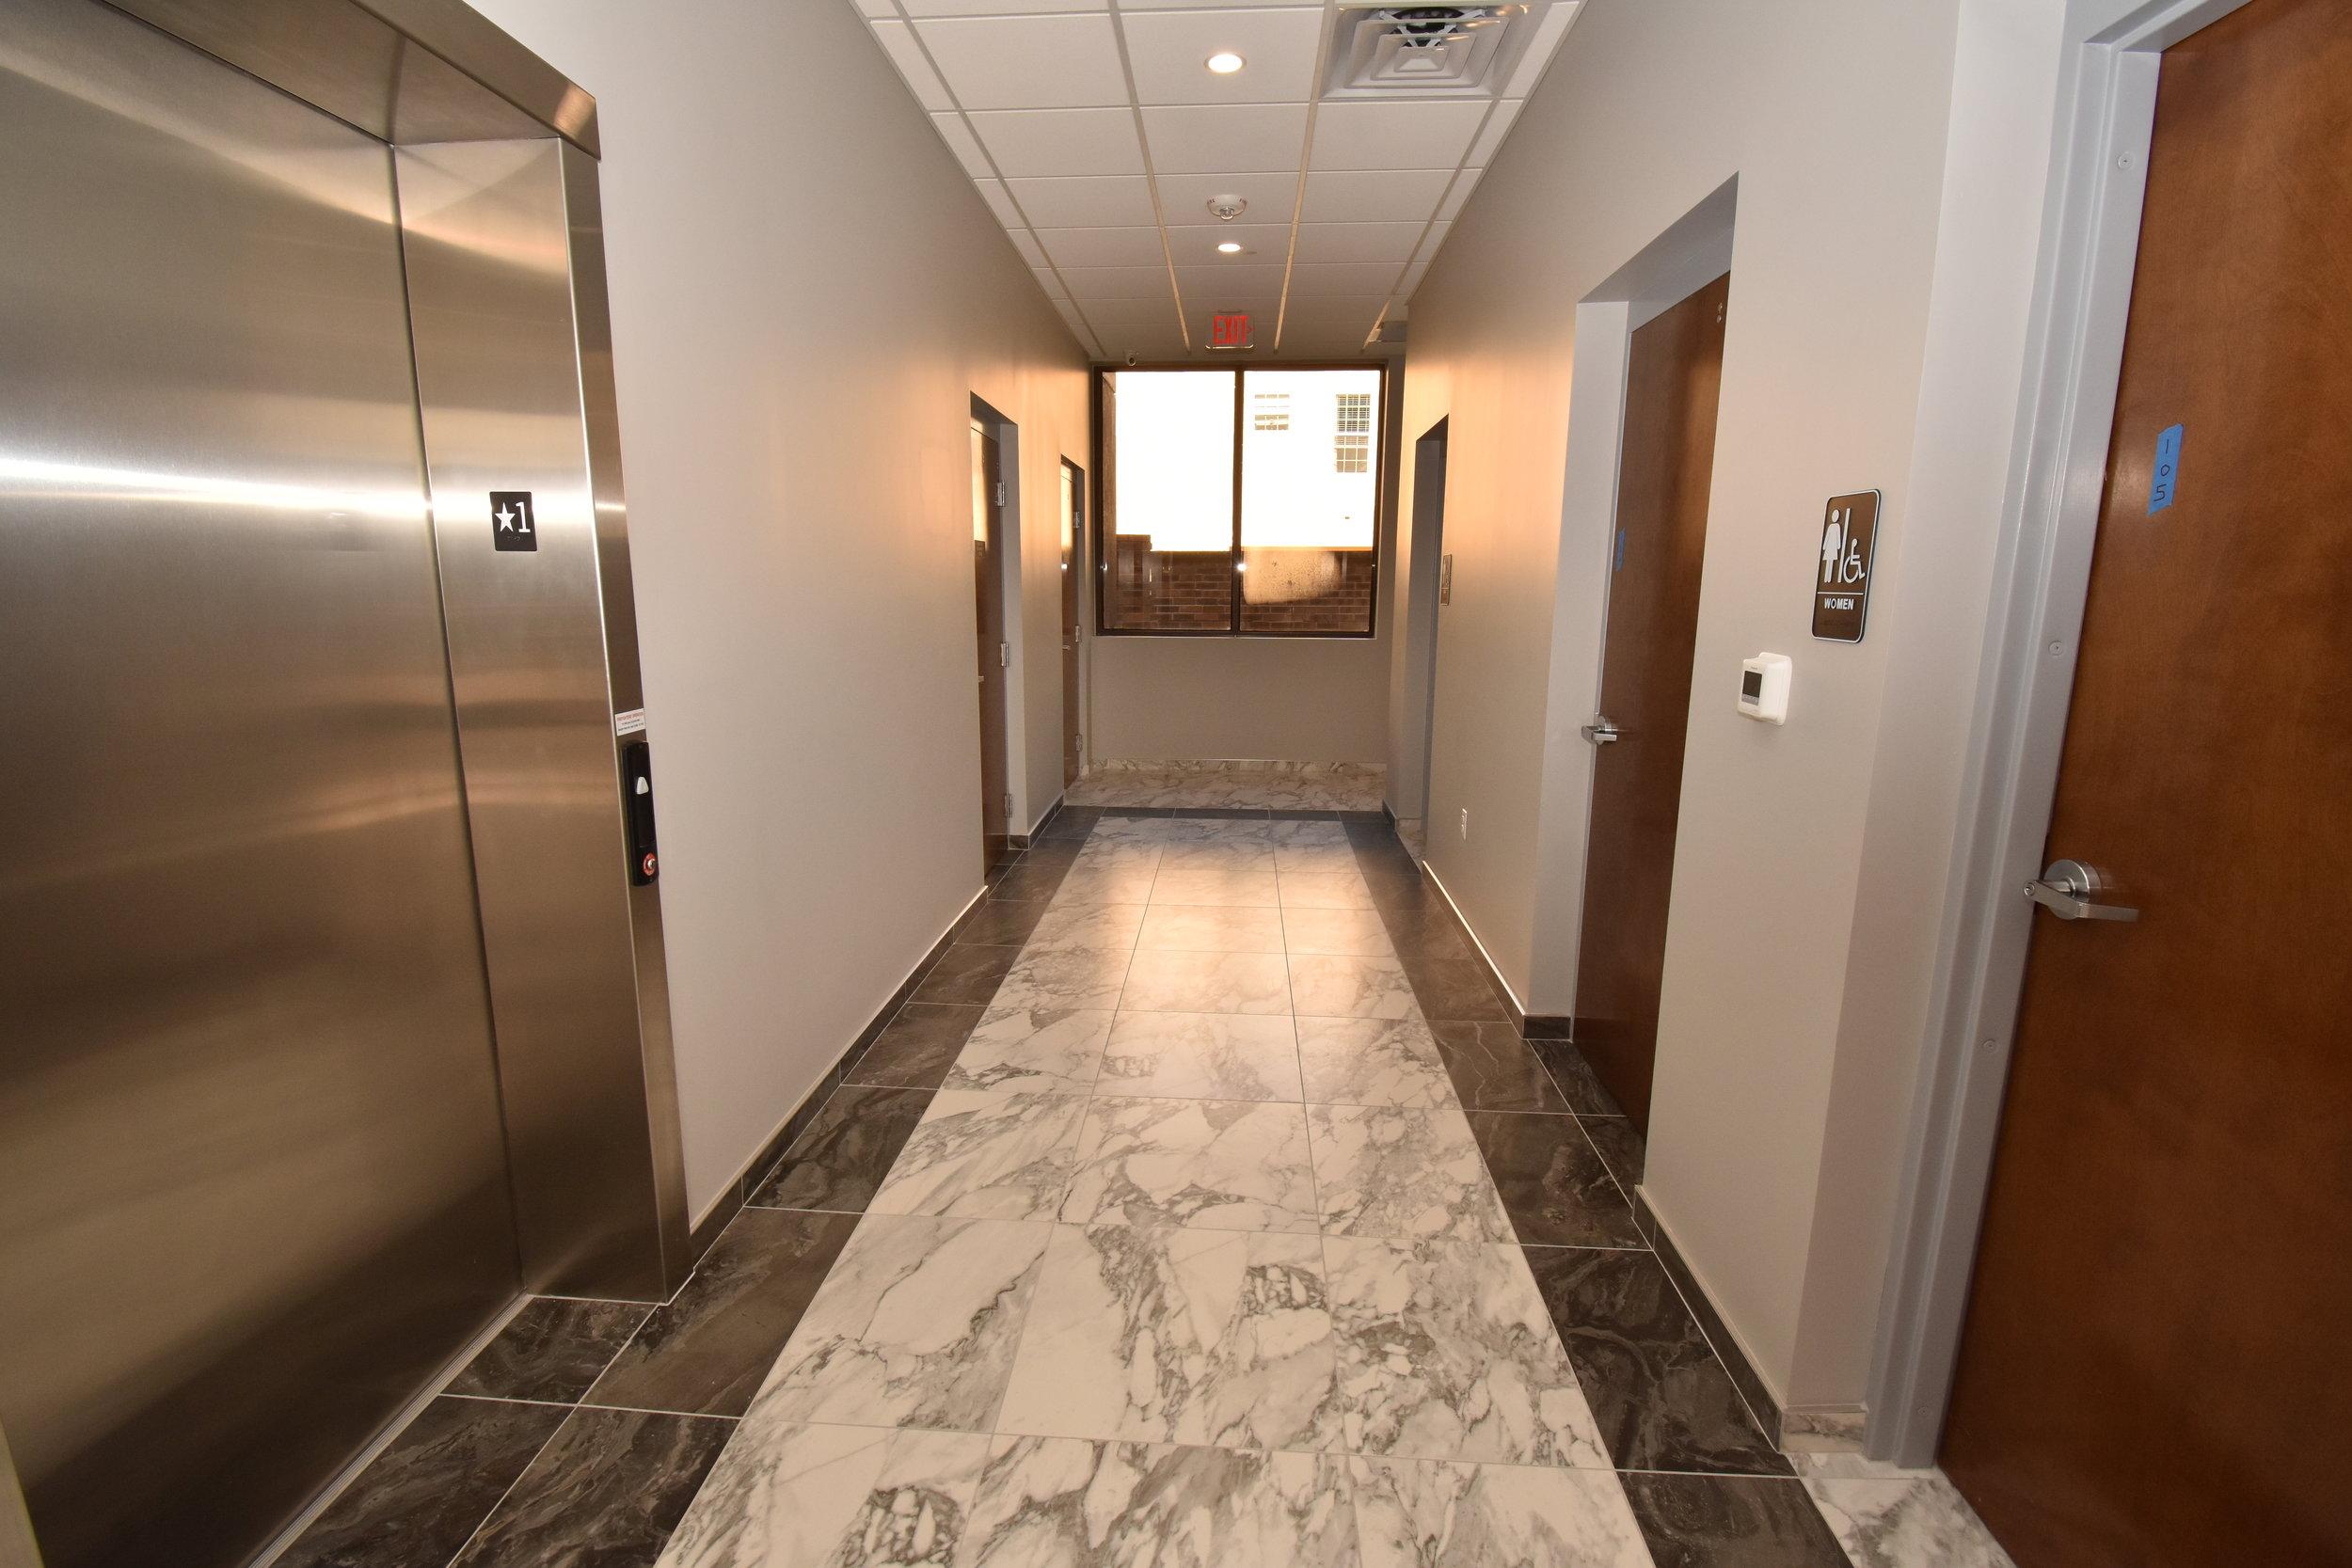 DS Elevtor Hallway.JPG